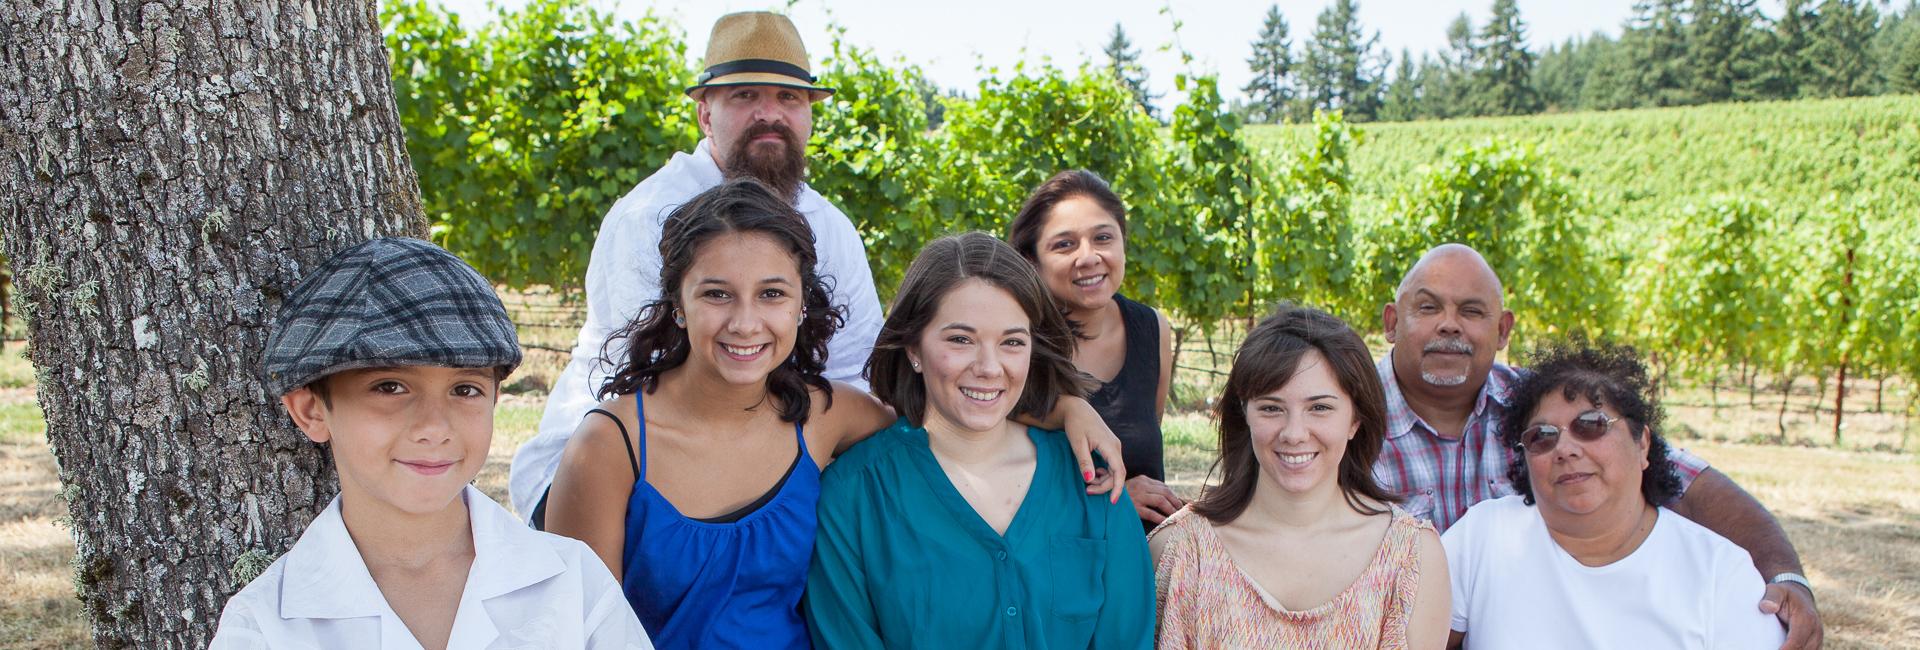 Family portrait at Zenith Vineyard in Zenith Oregon